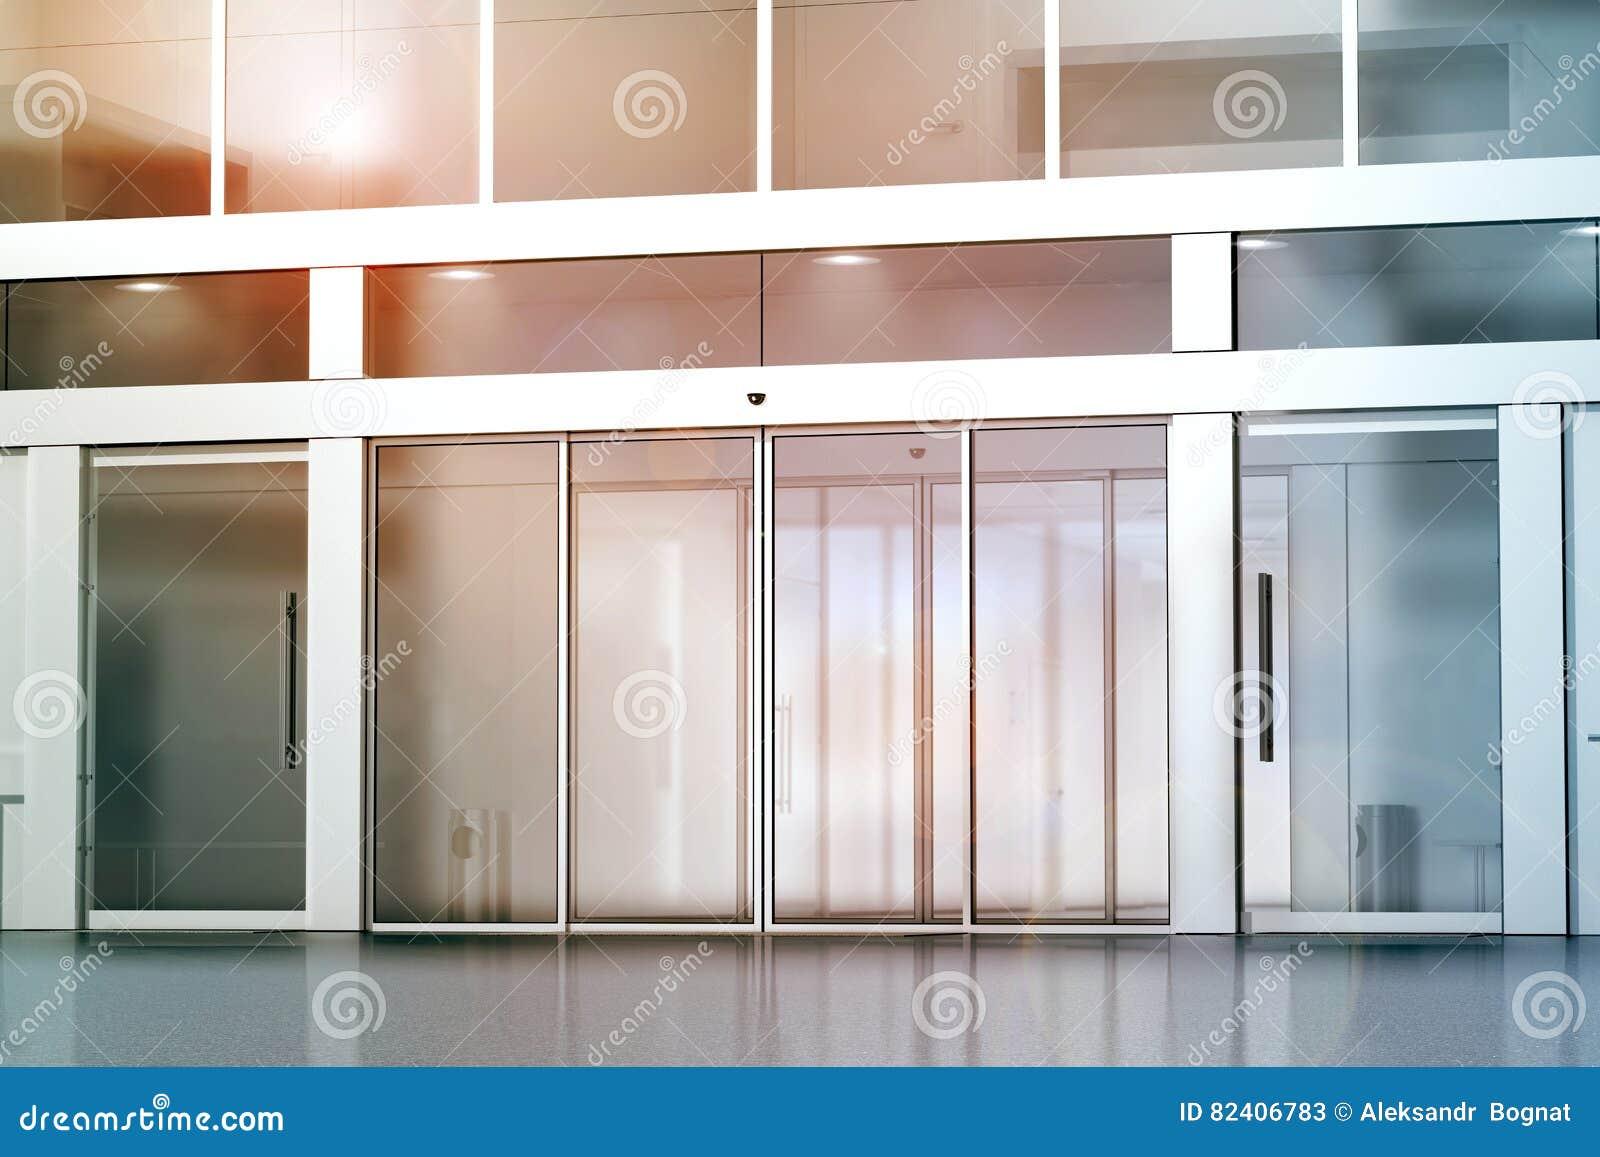 Blank Sliding Glass Doors Entrance Mockup Stock Image Image Of